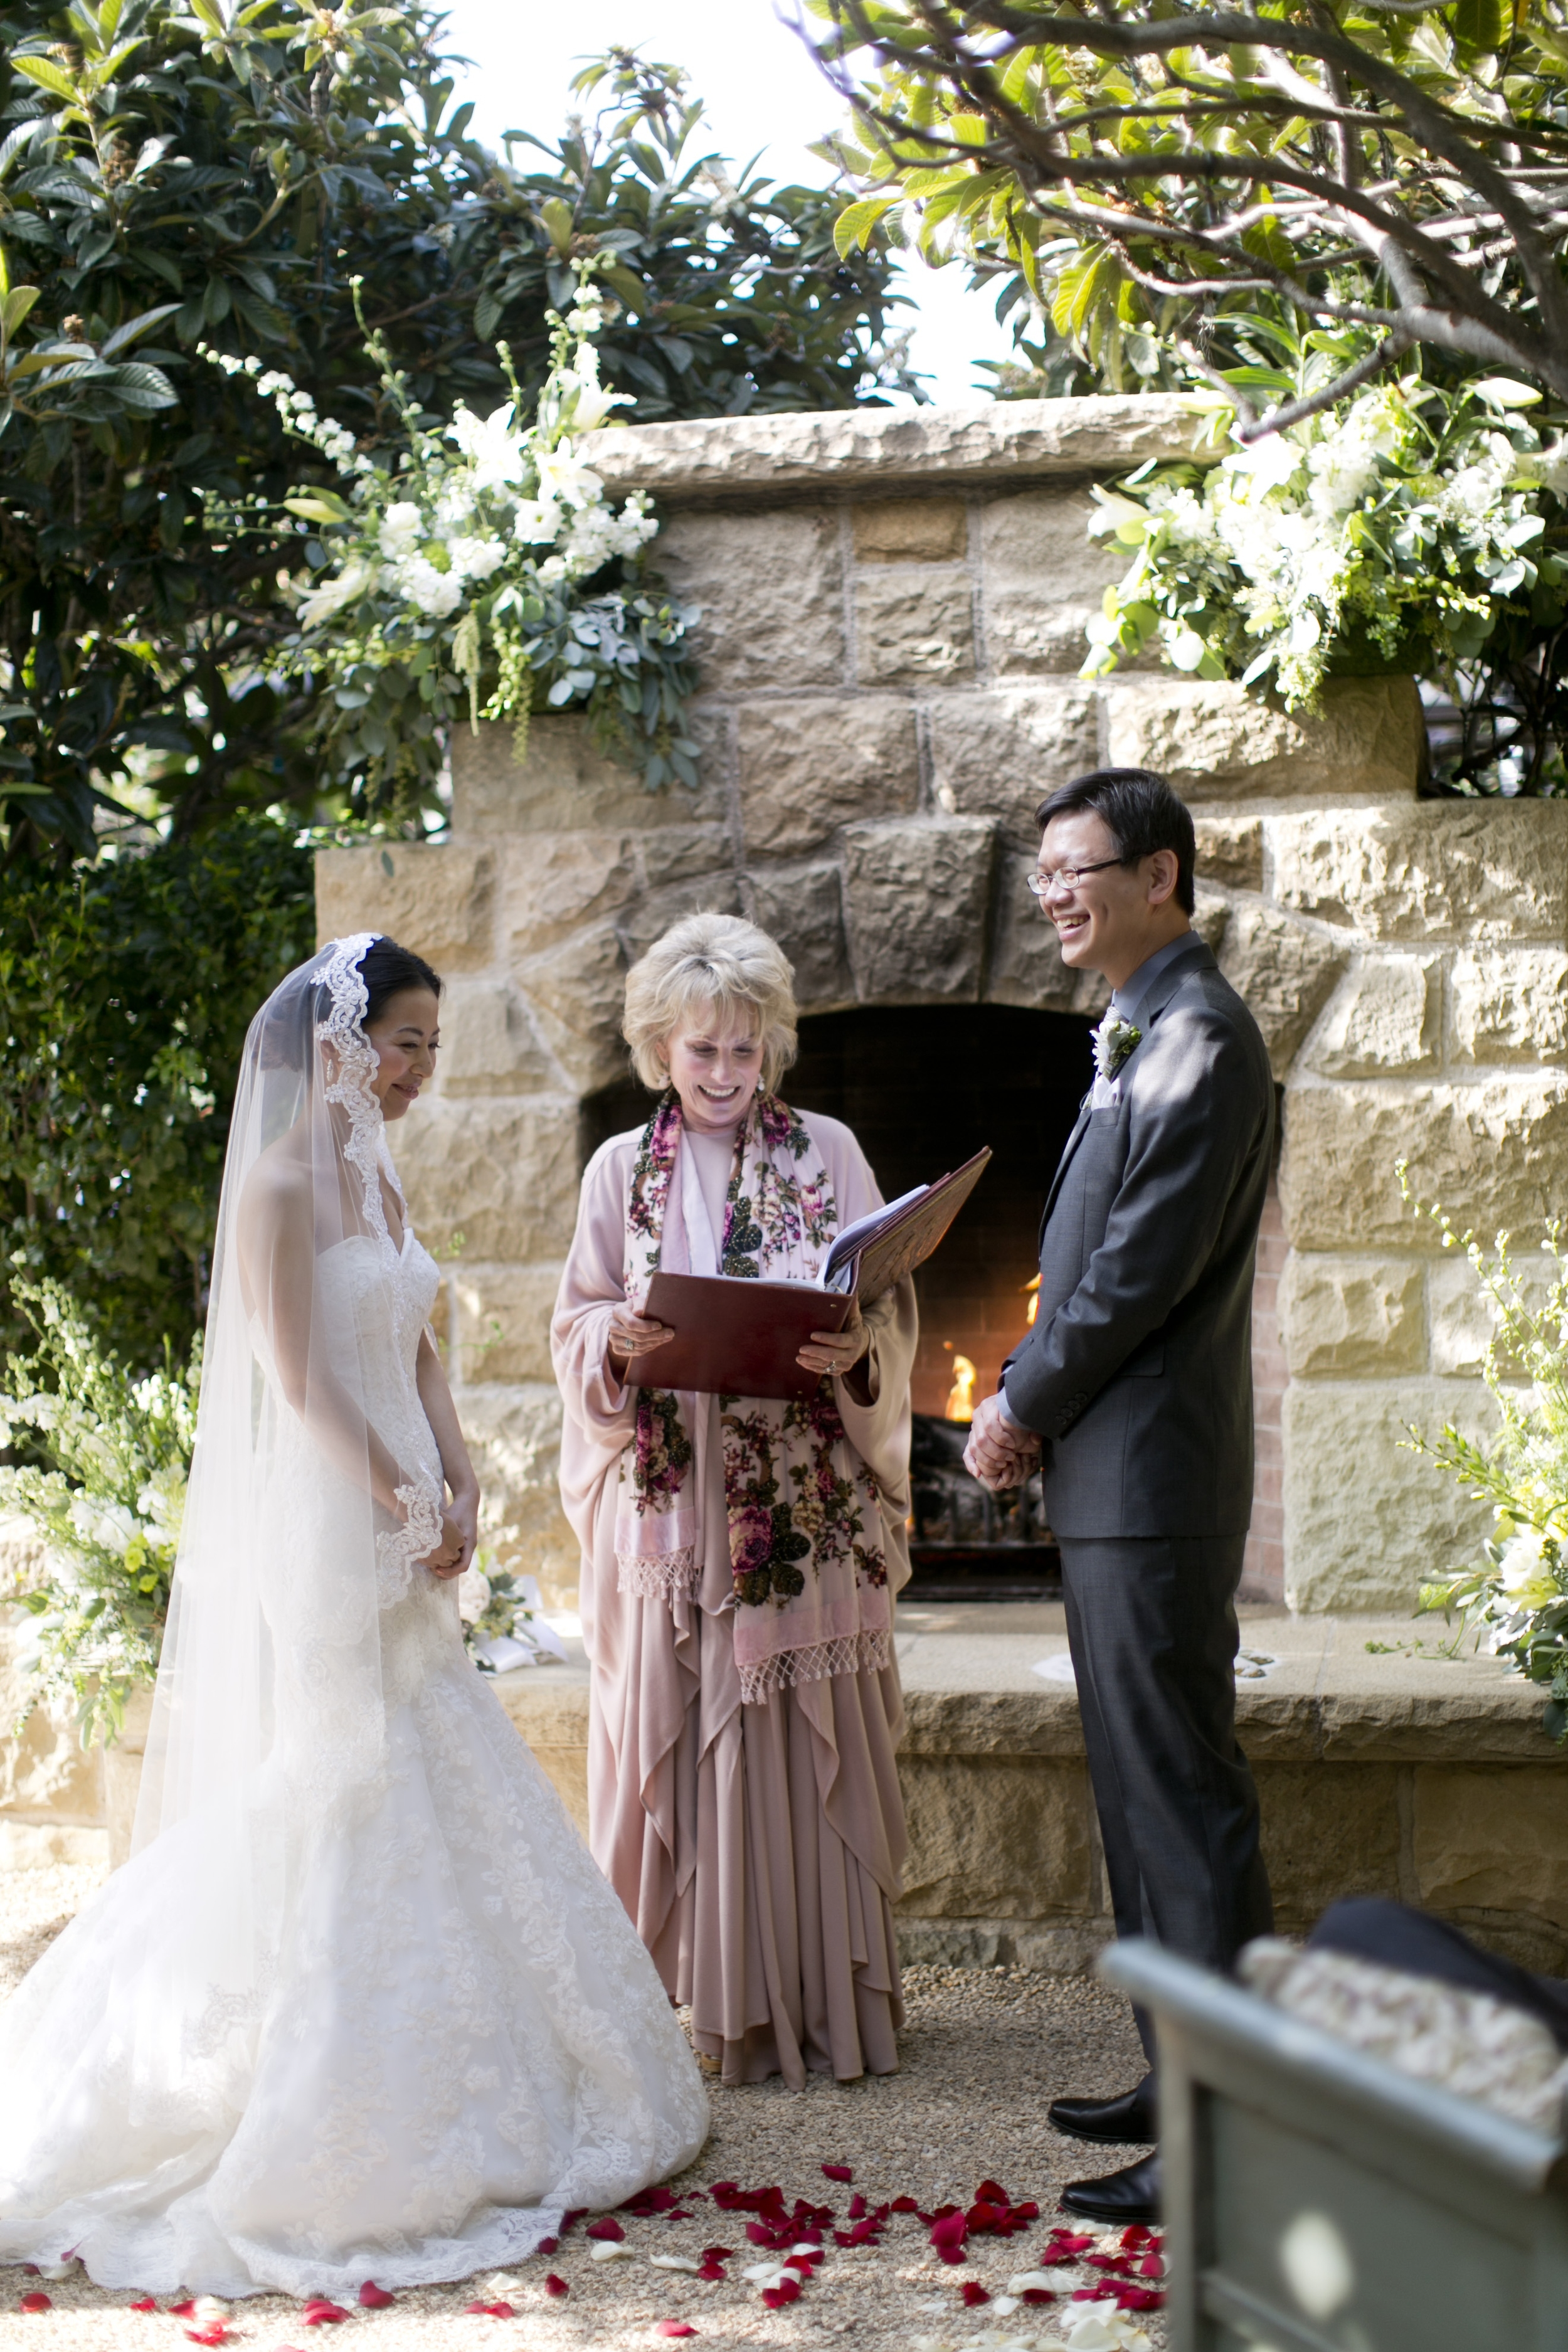 Miriam Lindbeck | Santa Barbara Wedding Officiant